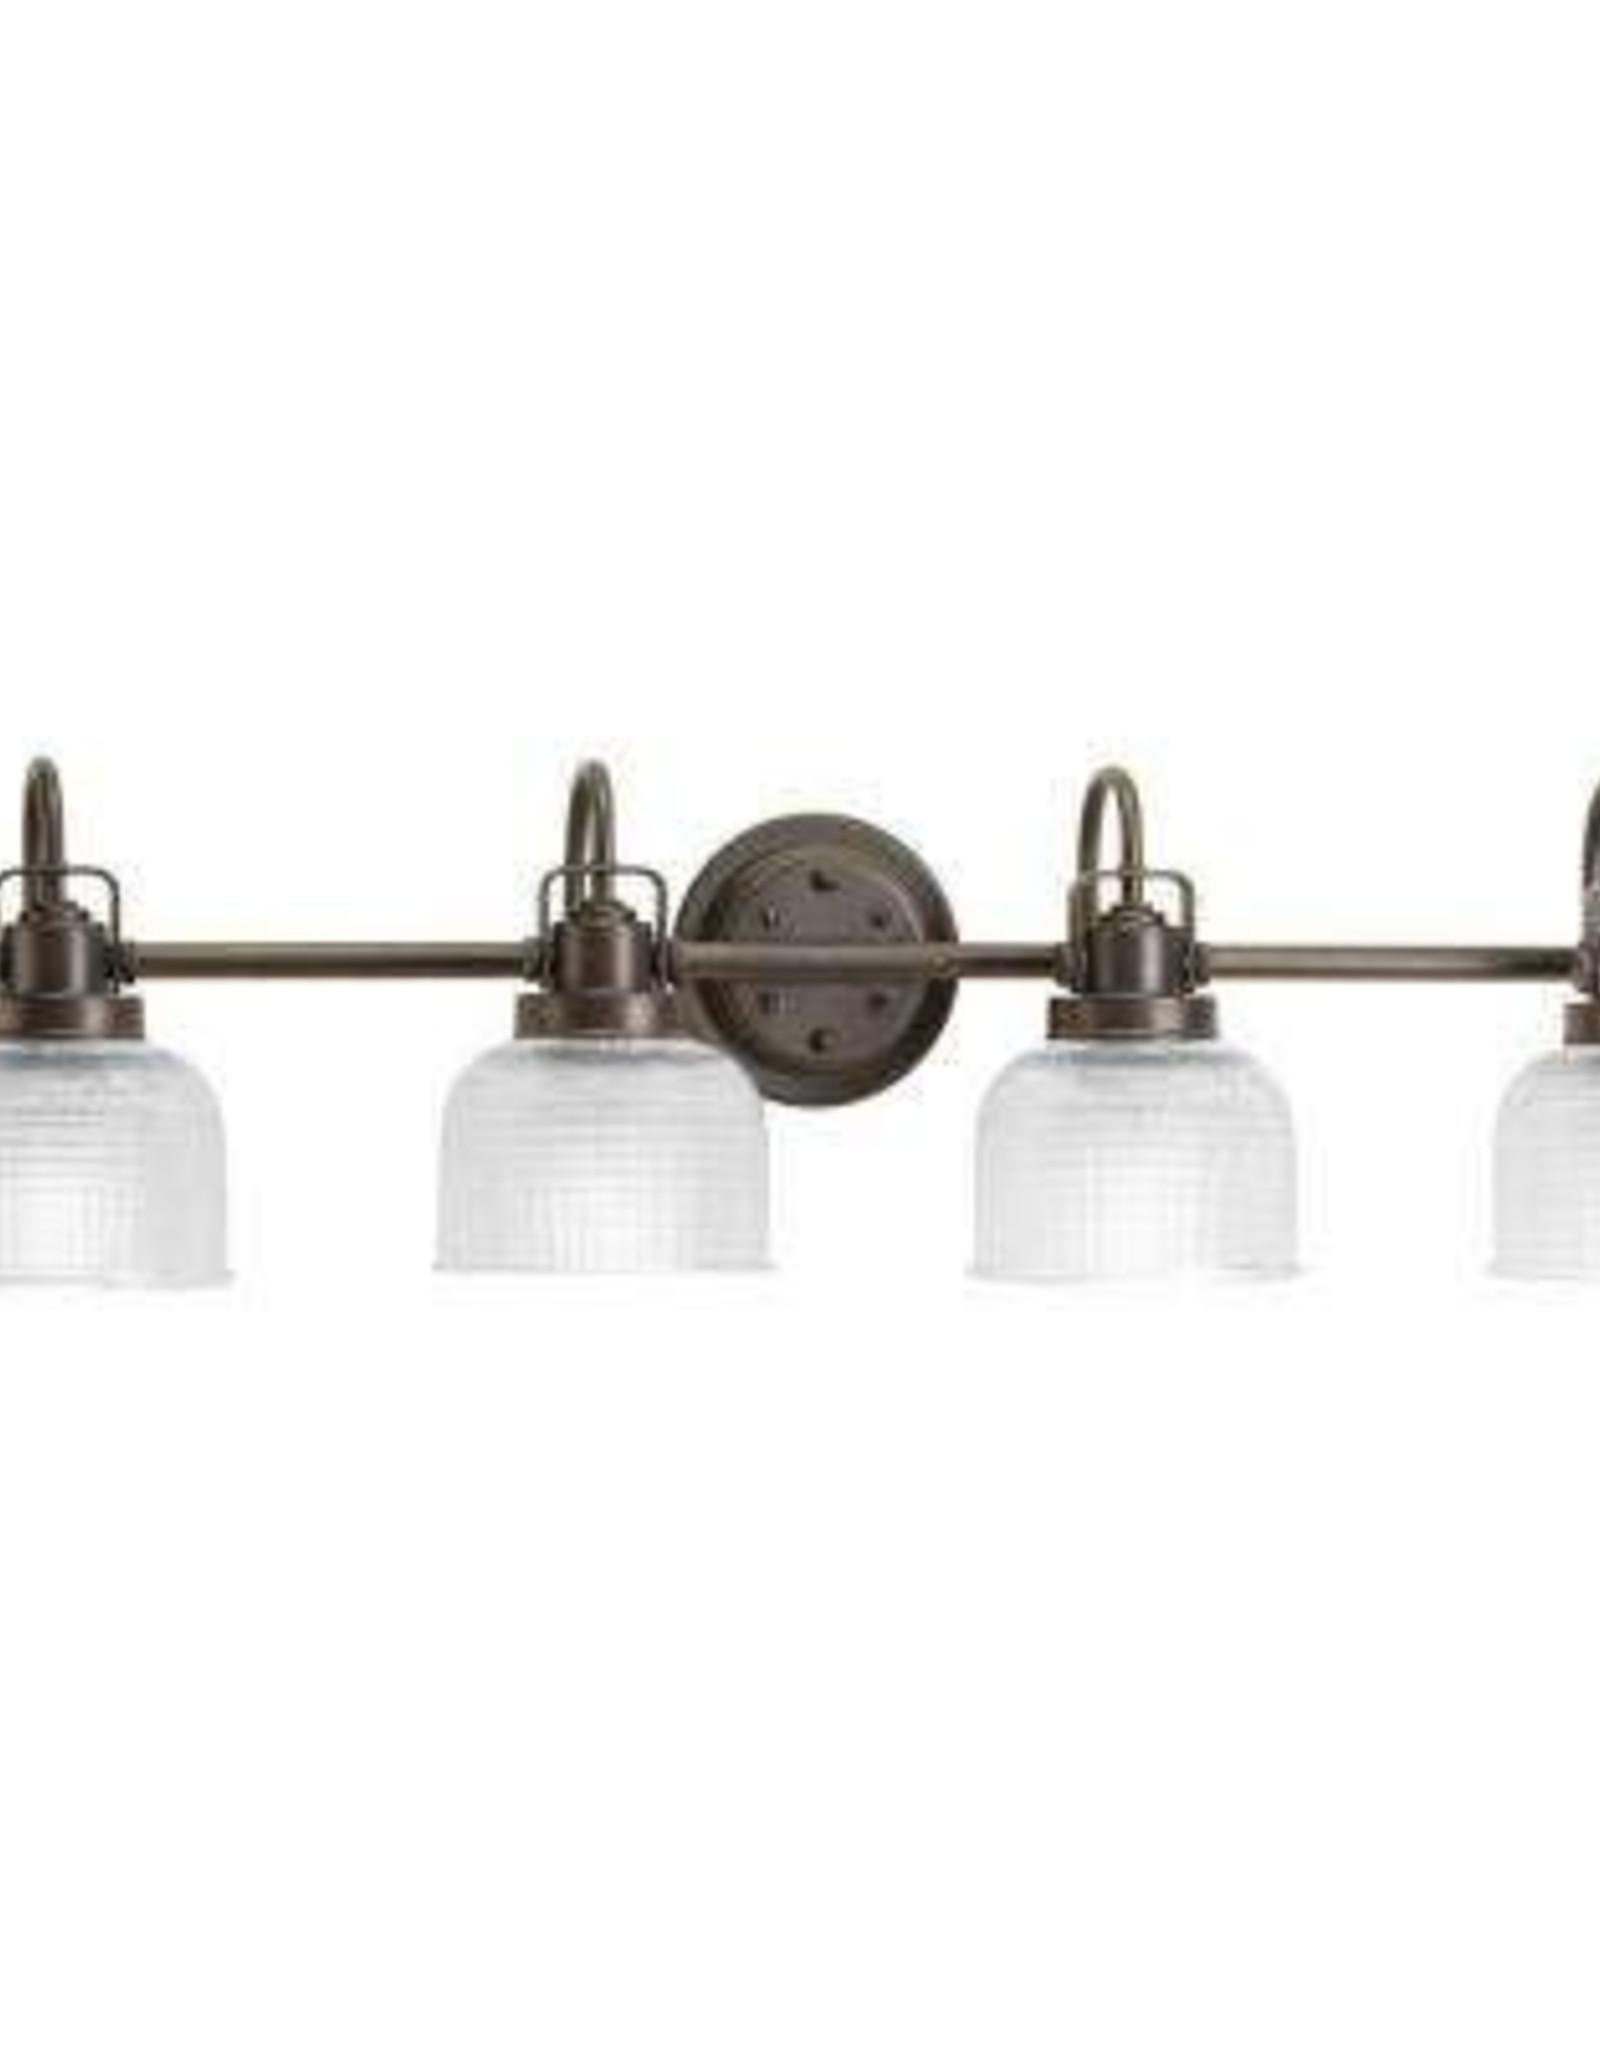 Progress Lighting Archie Collection 35.5 in. 4-Light Venetian Bronze Bathroom Vanity Light with Glass Shades